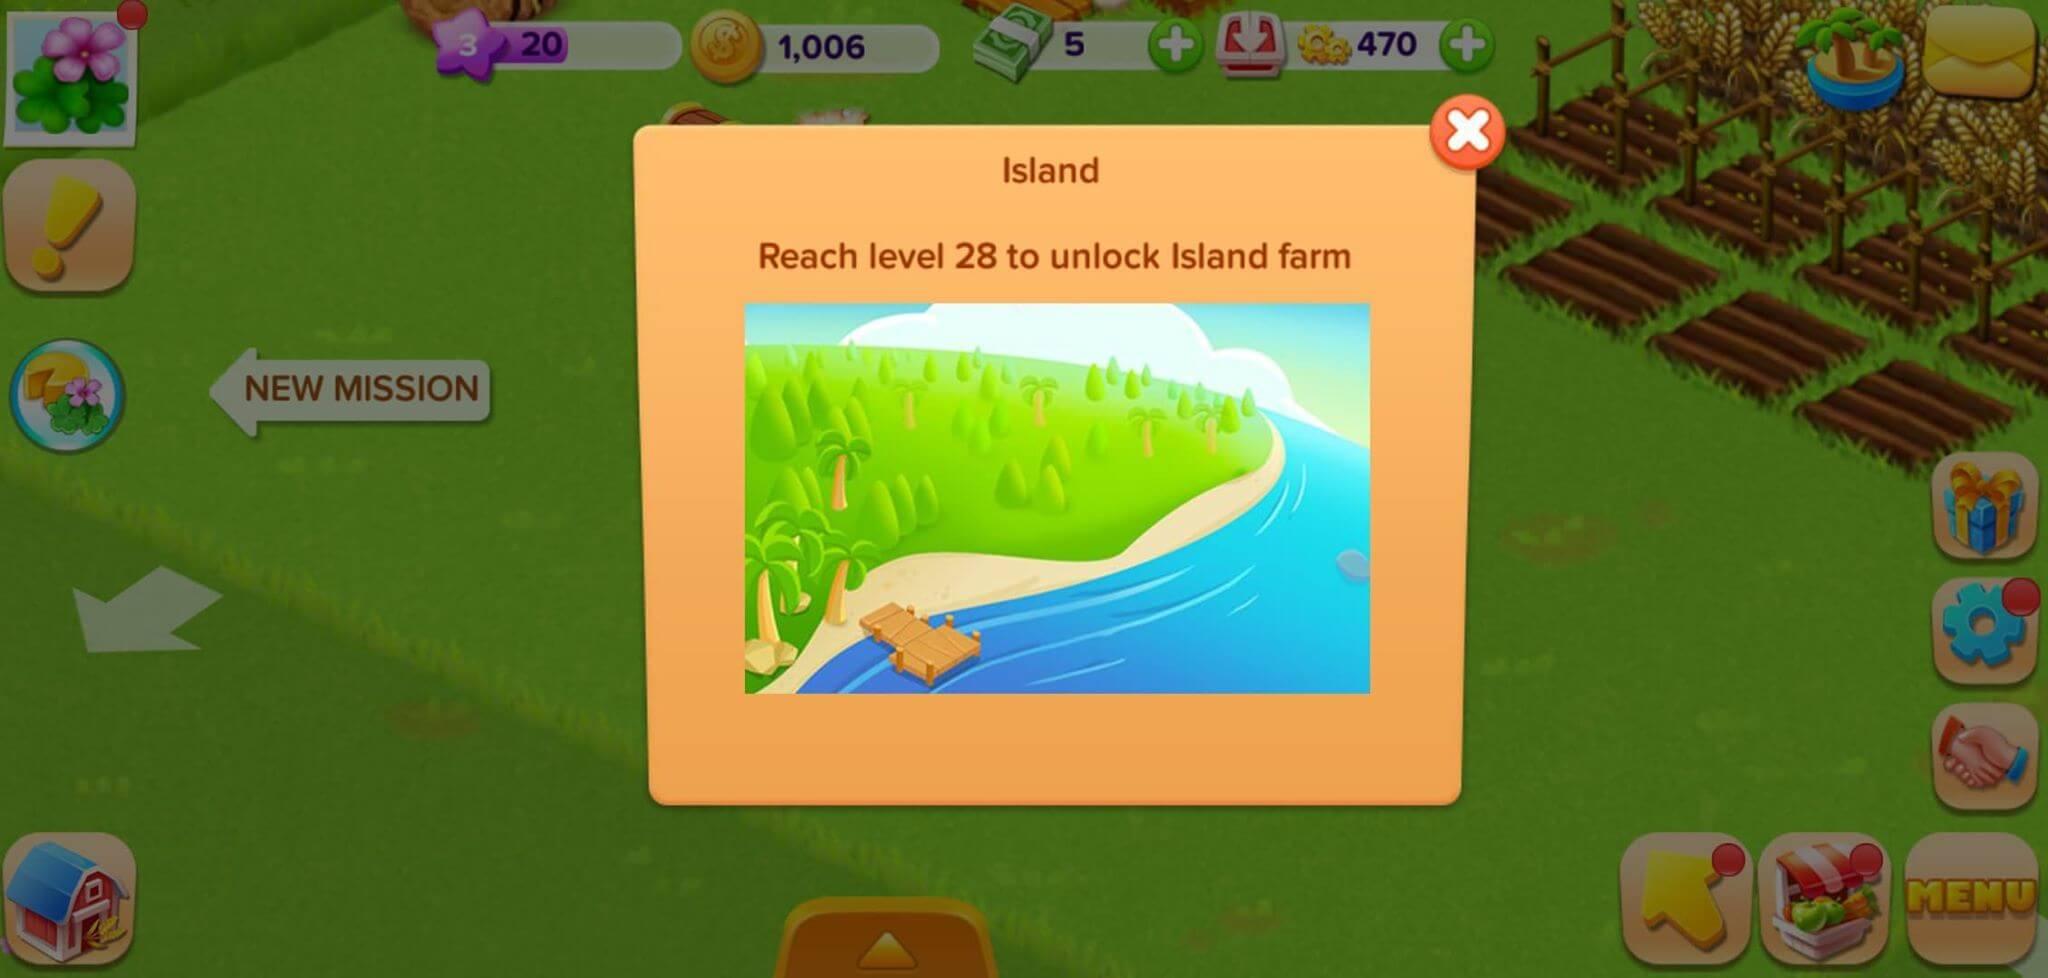 family farm unlocking island